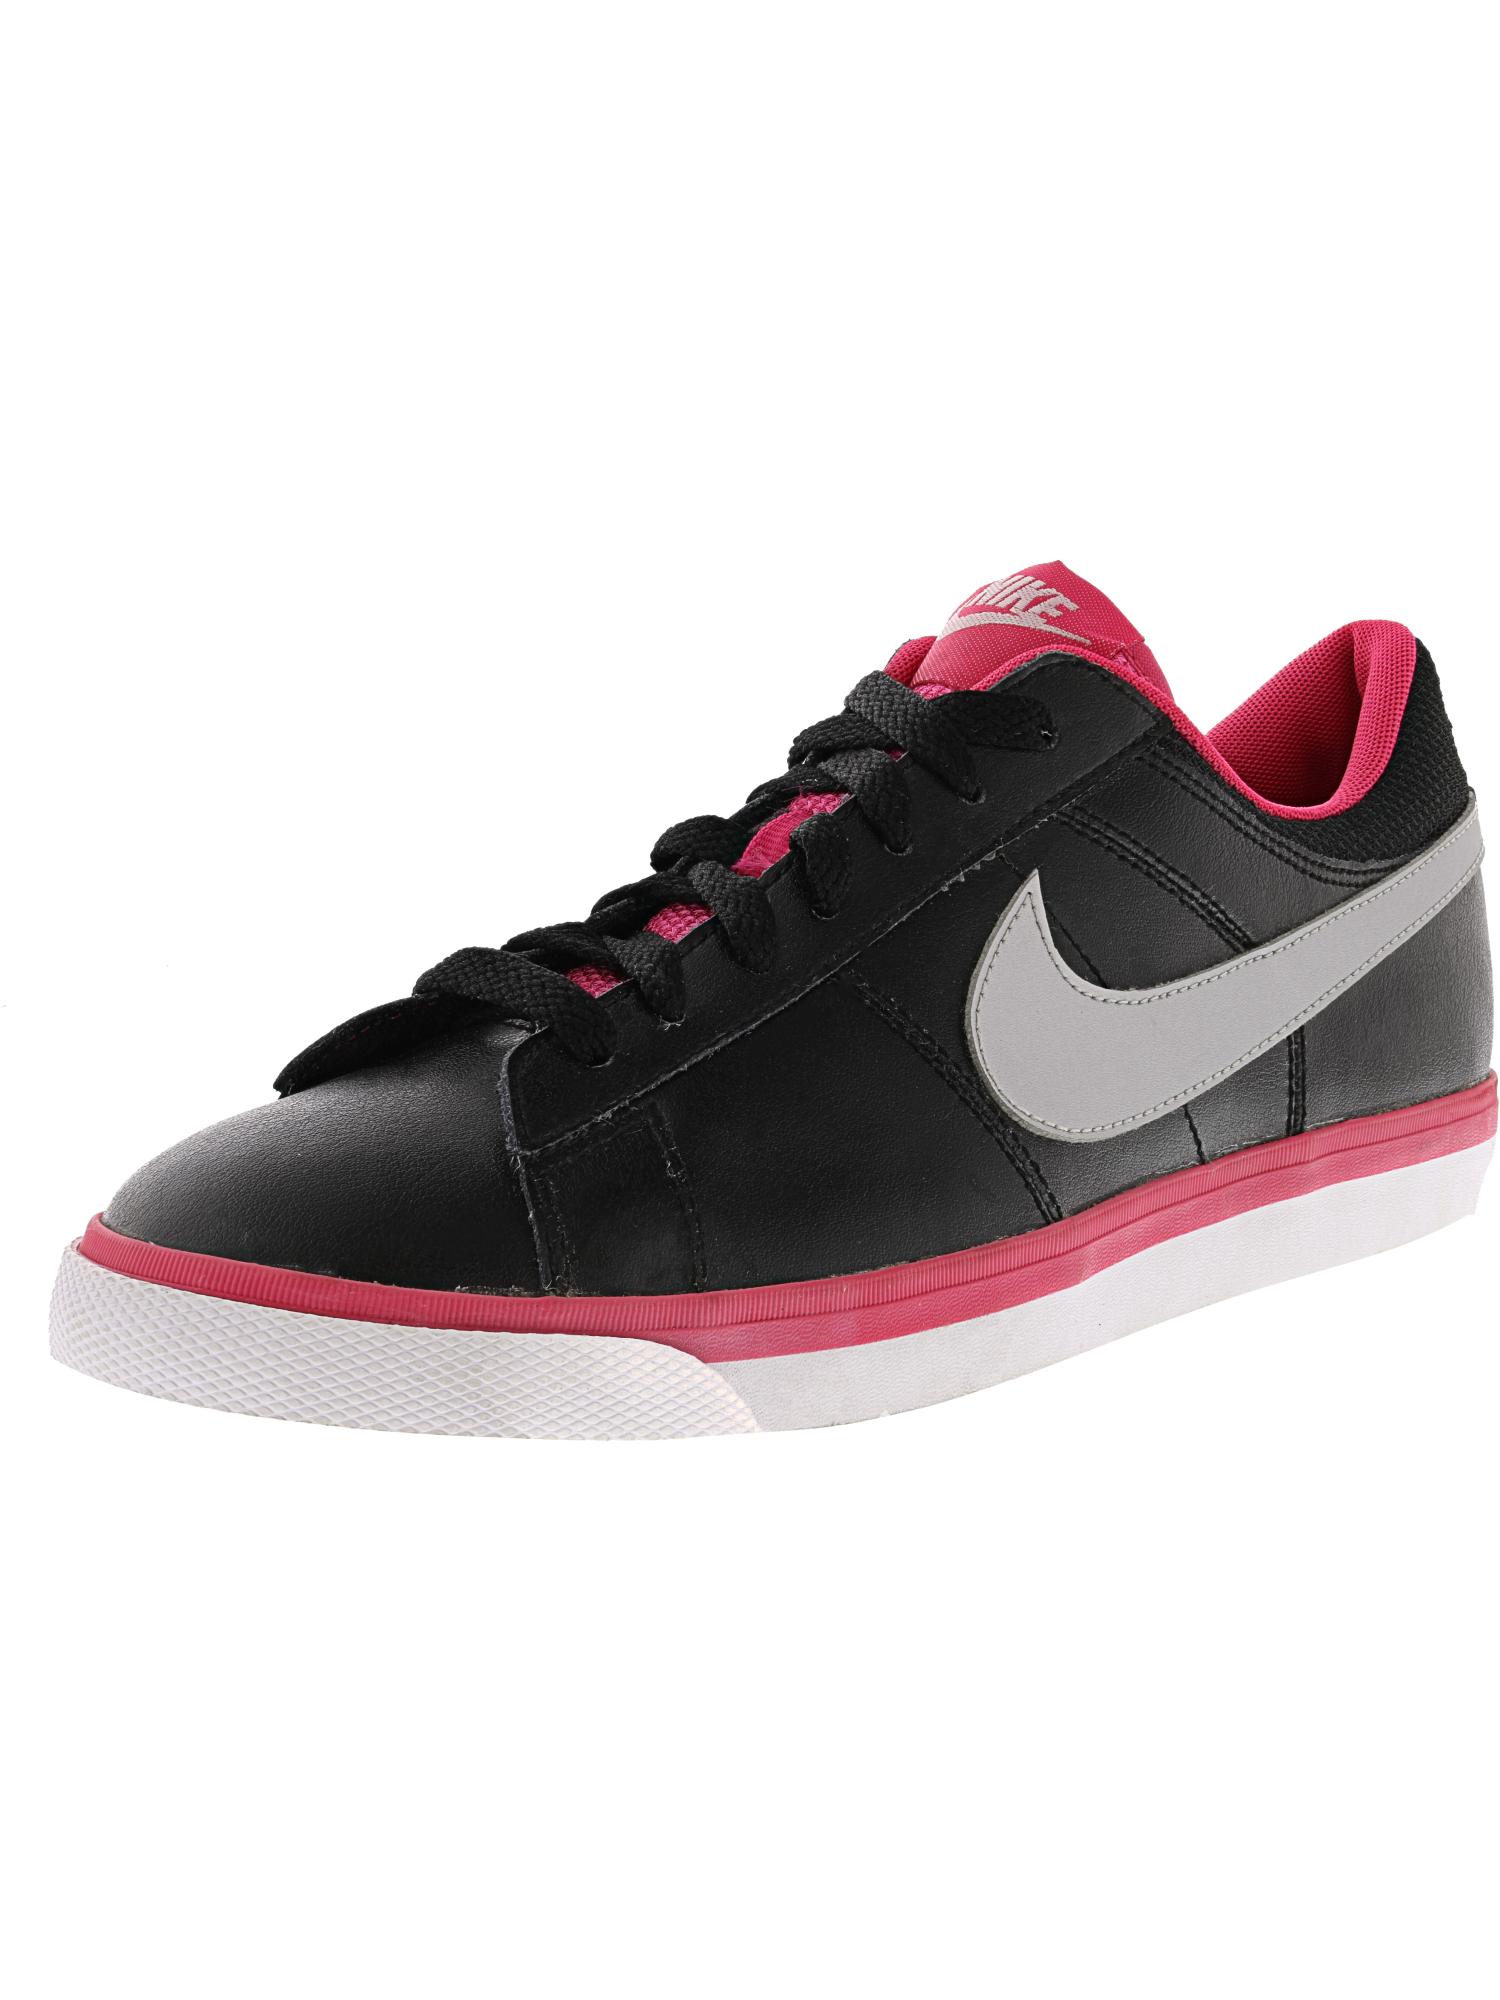 half off 786c8 d9215 ... Man s Woman s Nike Women s 631461 Ankle-High Fashion Fashion Fashion  Sneaker Promotion Year-